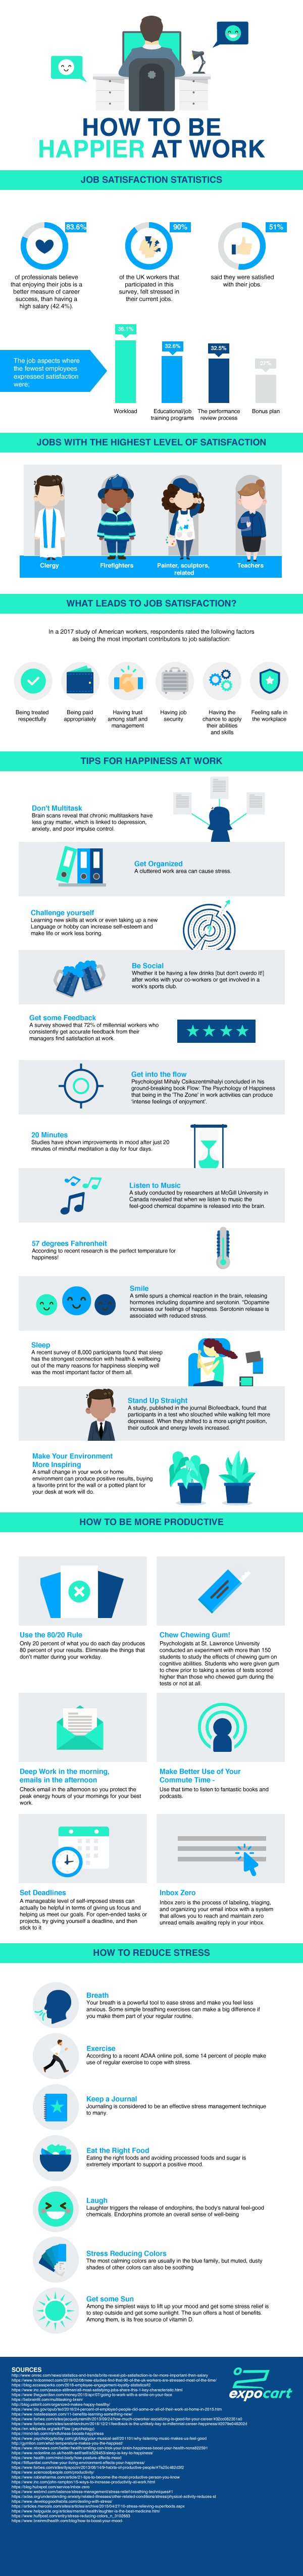 Happier Work Tips Infographic Image